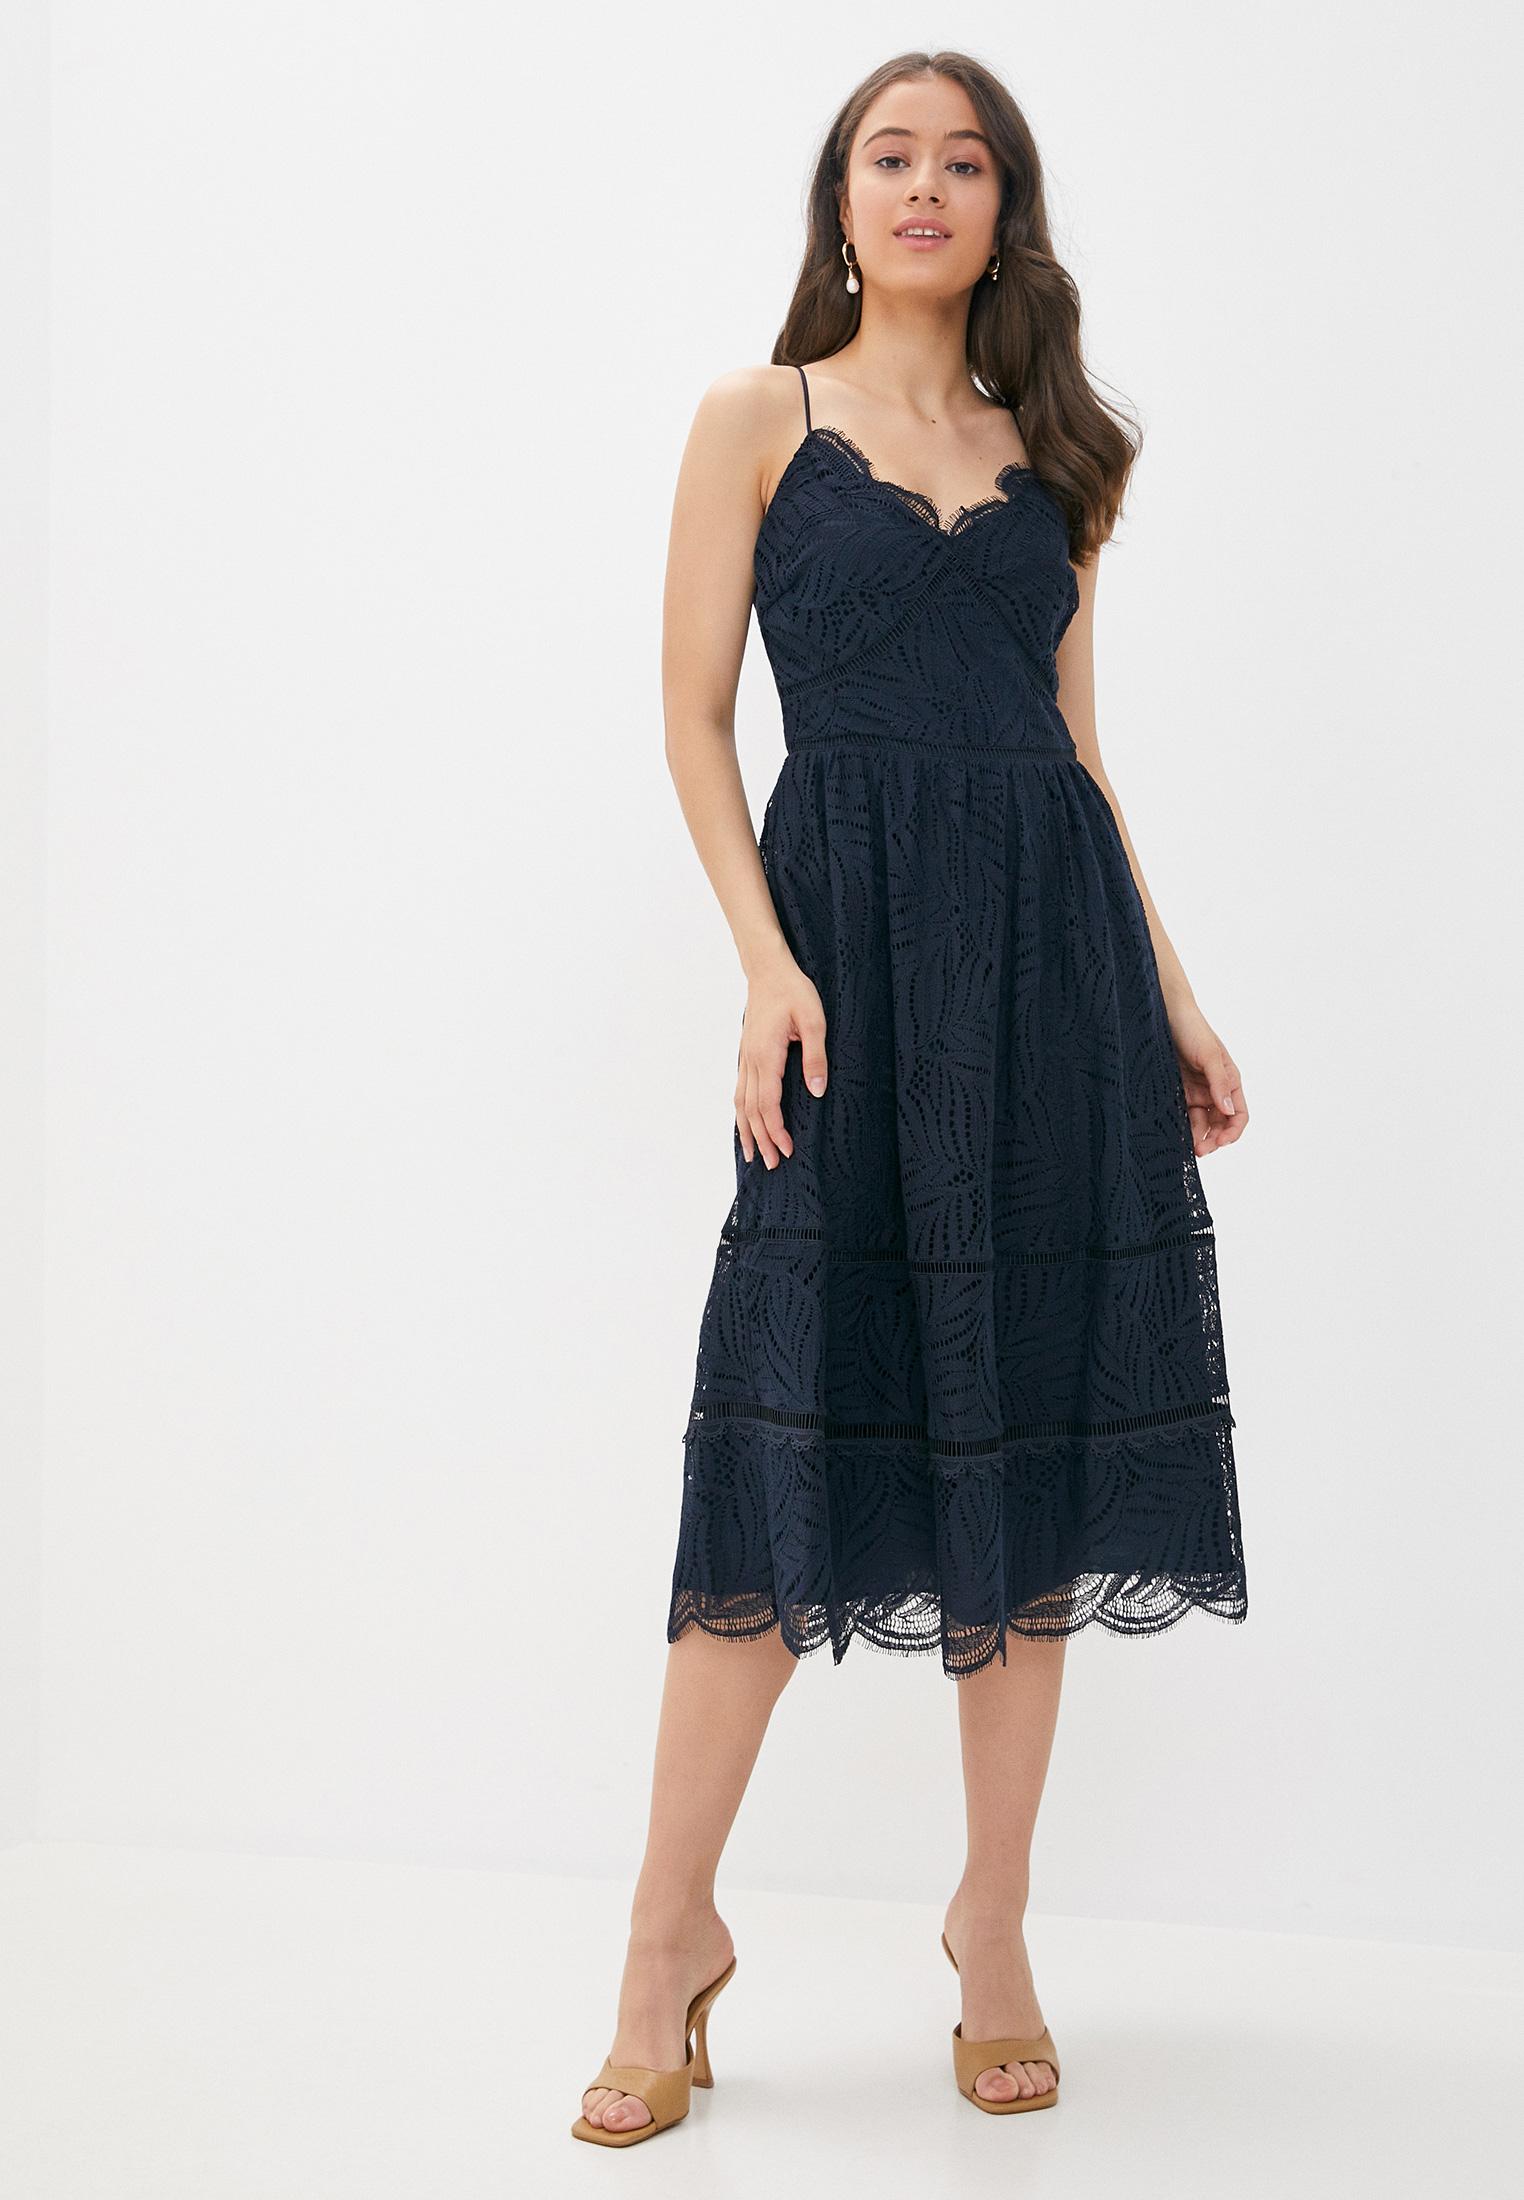 Платье Tommy Hilfiger (Томми Хилфигер) WW0WW28418